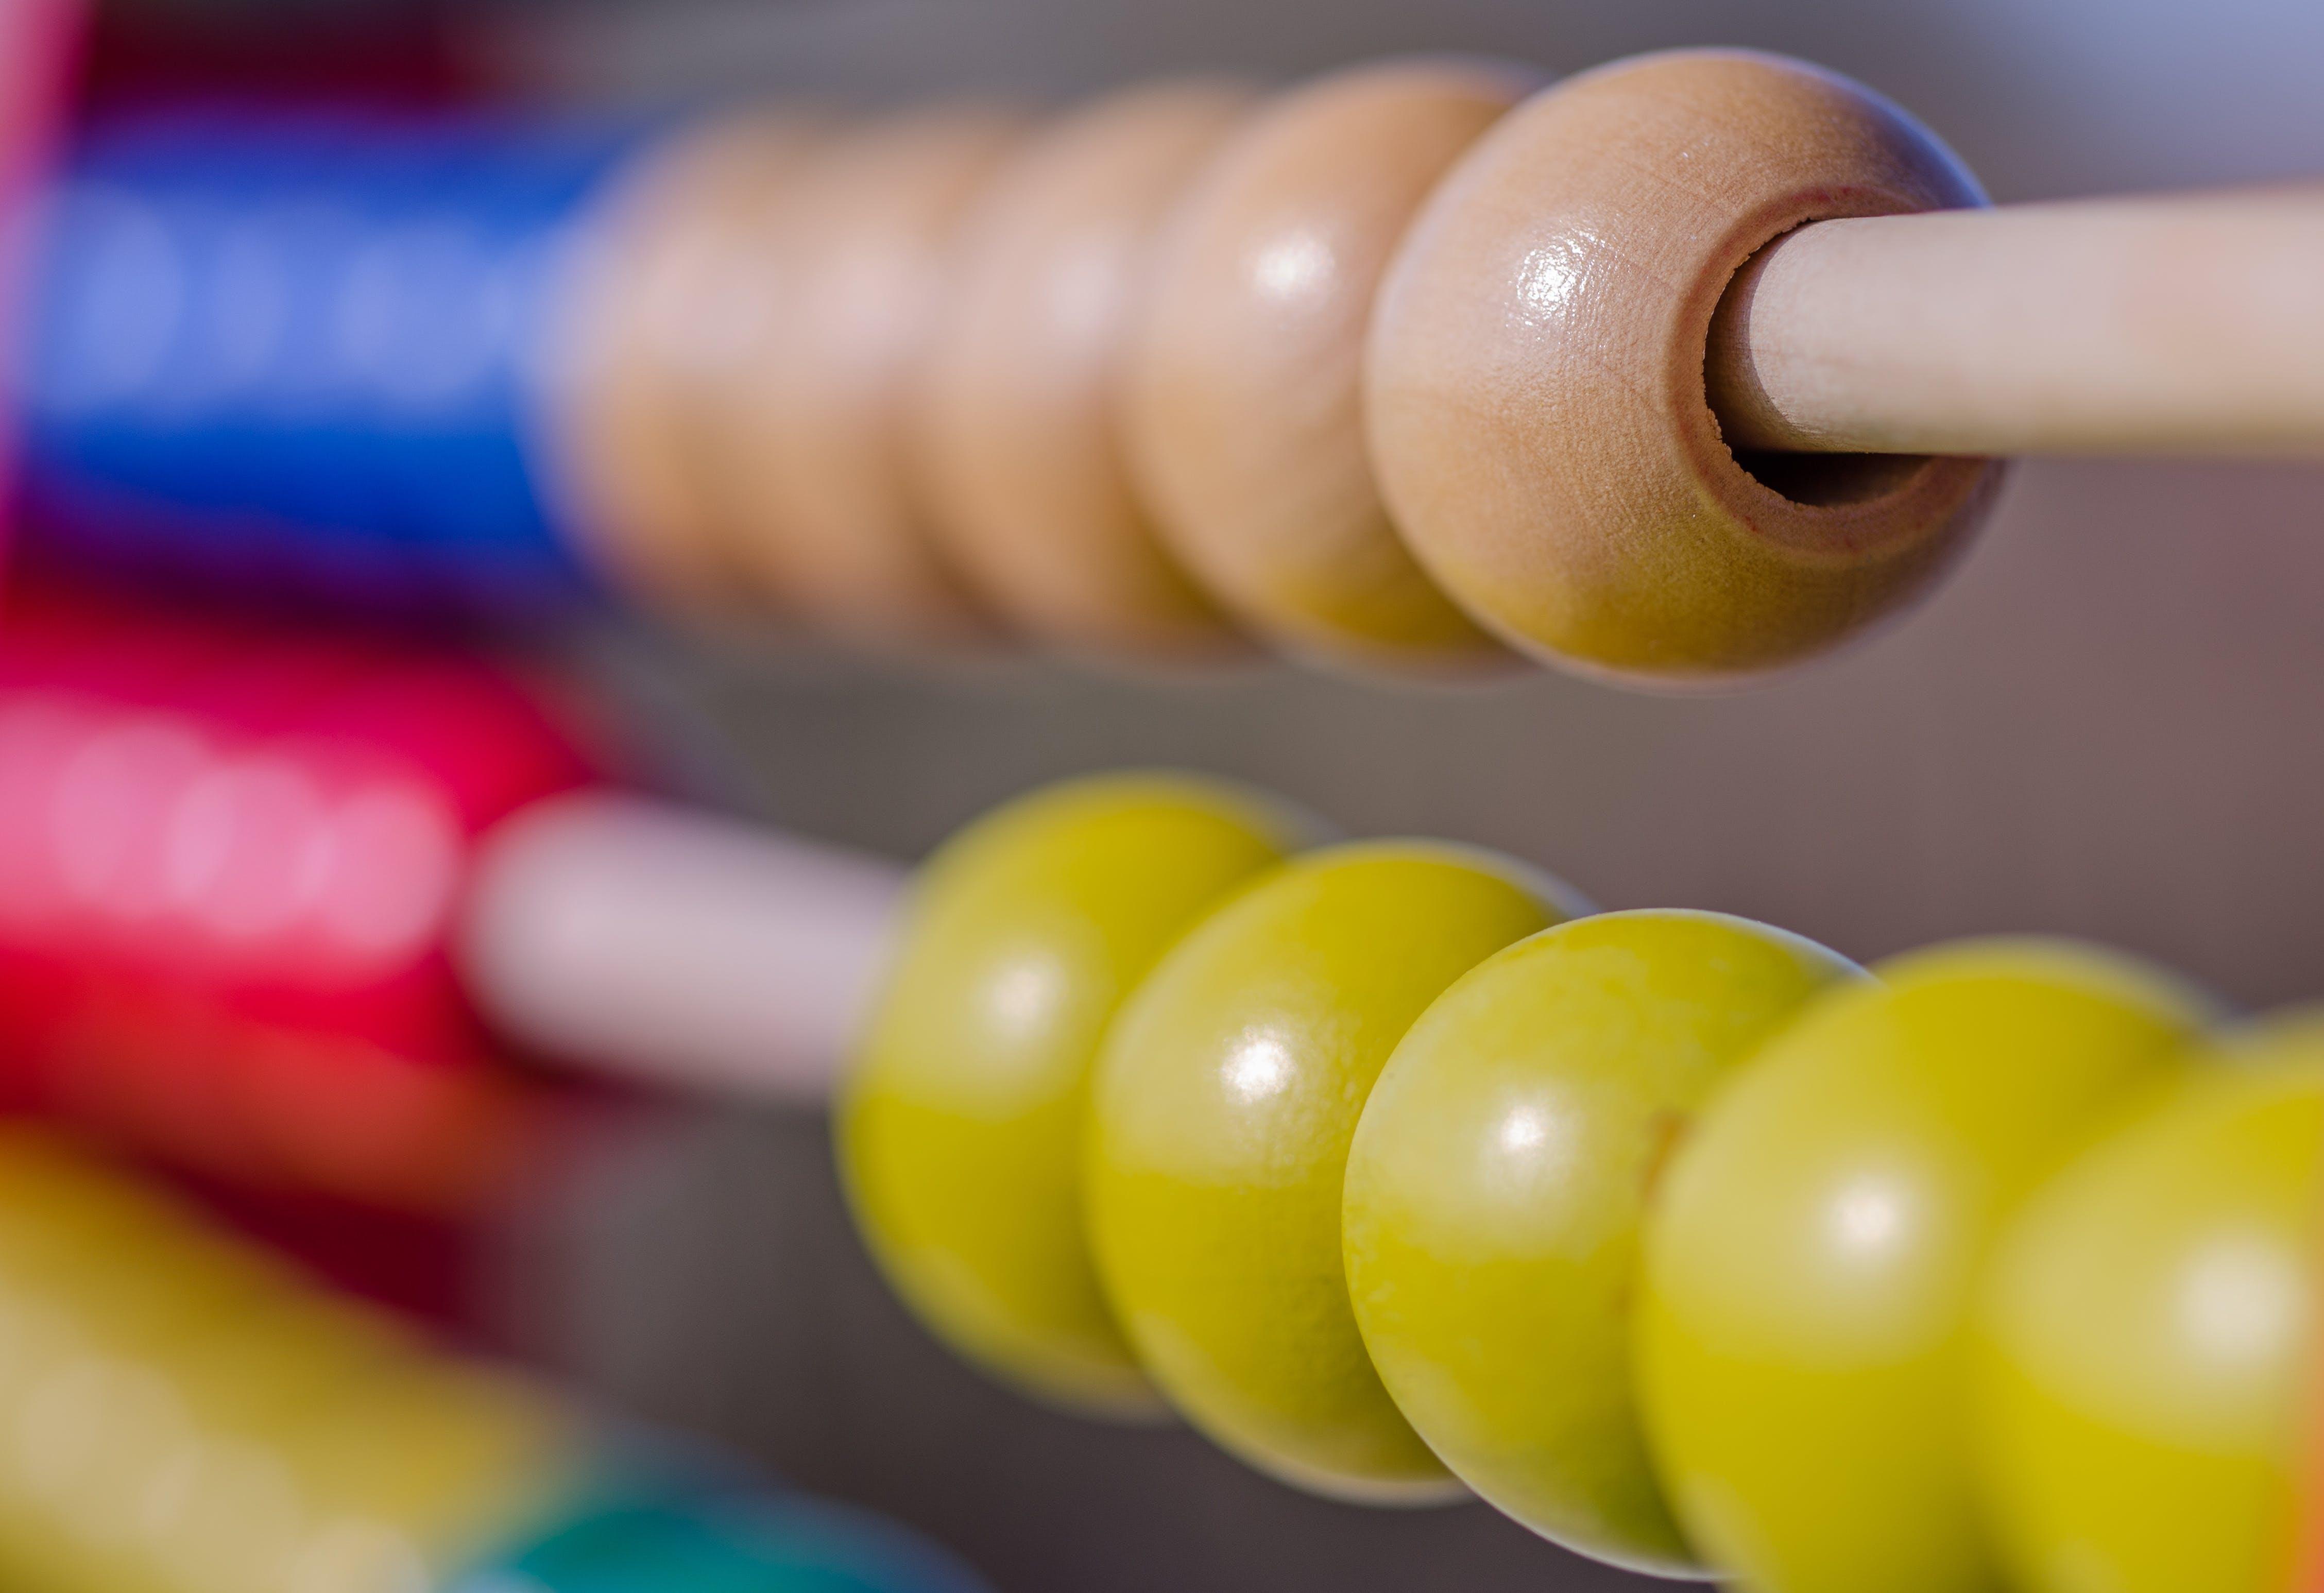 Free stock photo of wood, office, mathematics, colorful